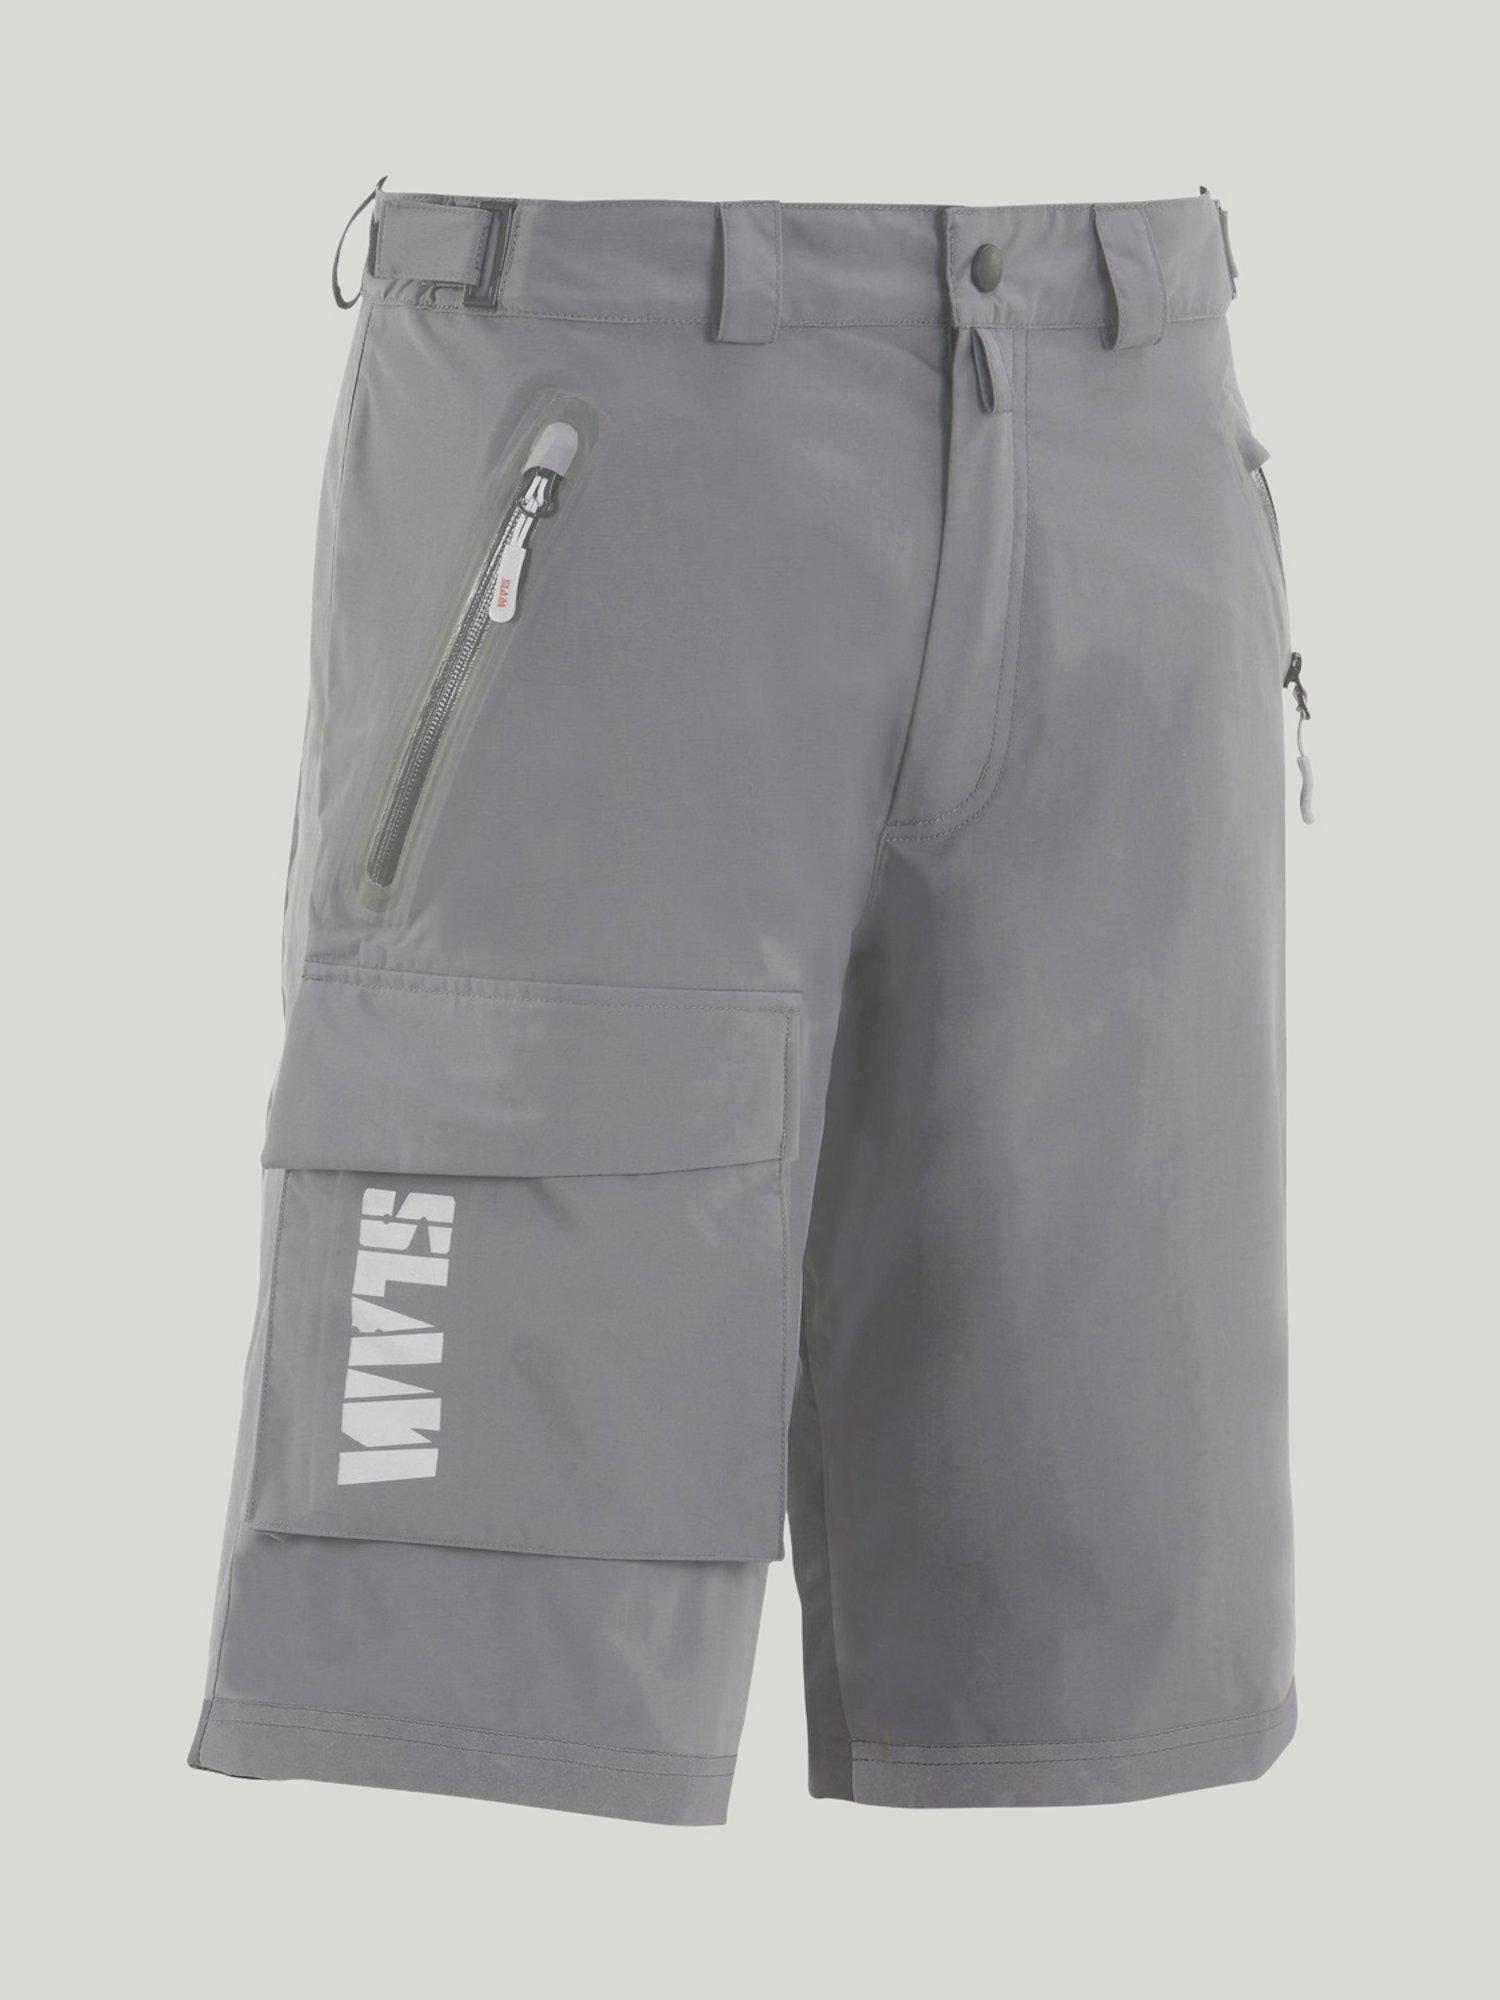 Force 2 Short - Grey